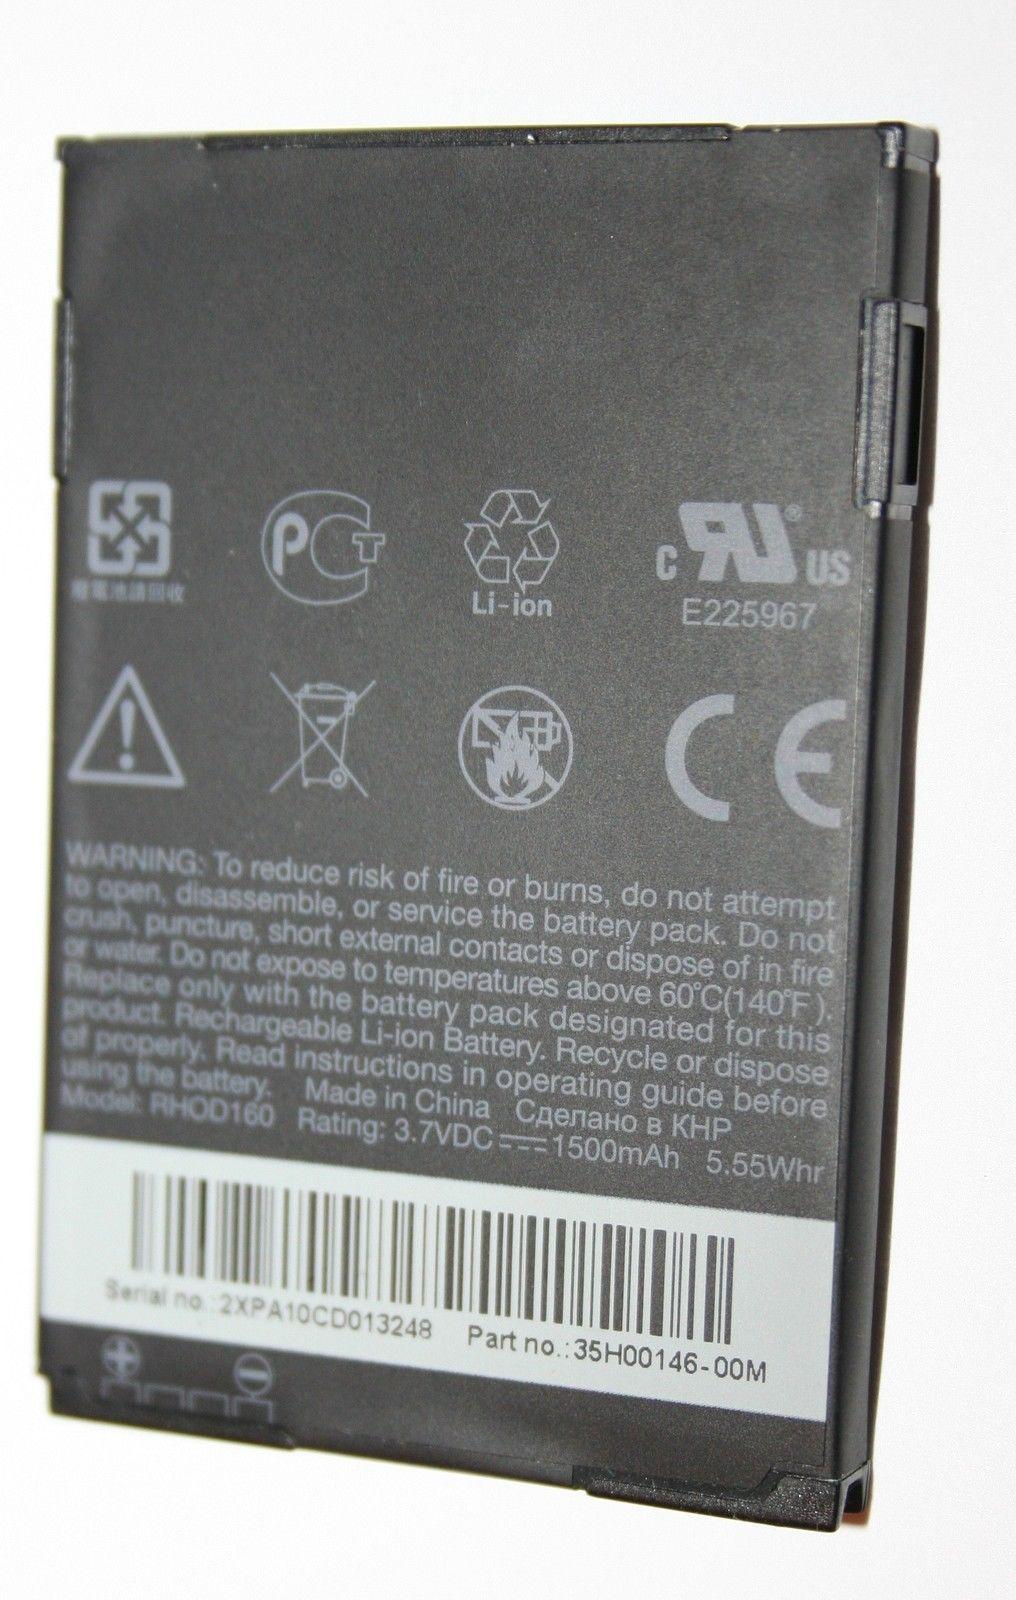 OEM Battery for HTC Evo Shift 4G Sprint RHOD160 1500mAh Part no. 35H00146-00M